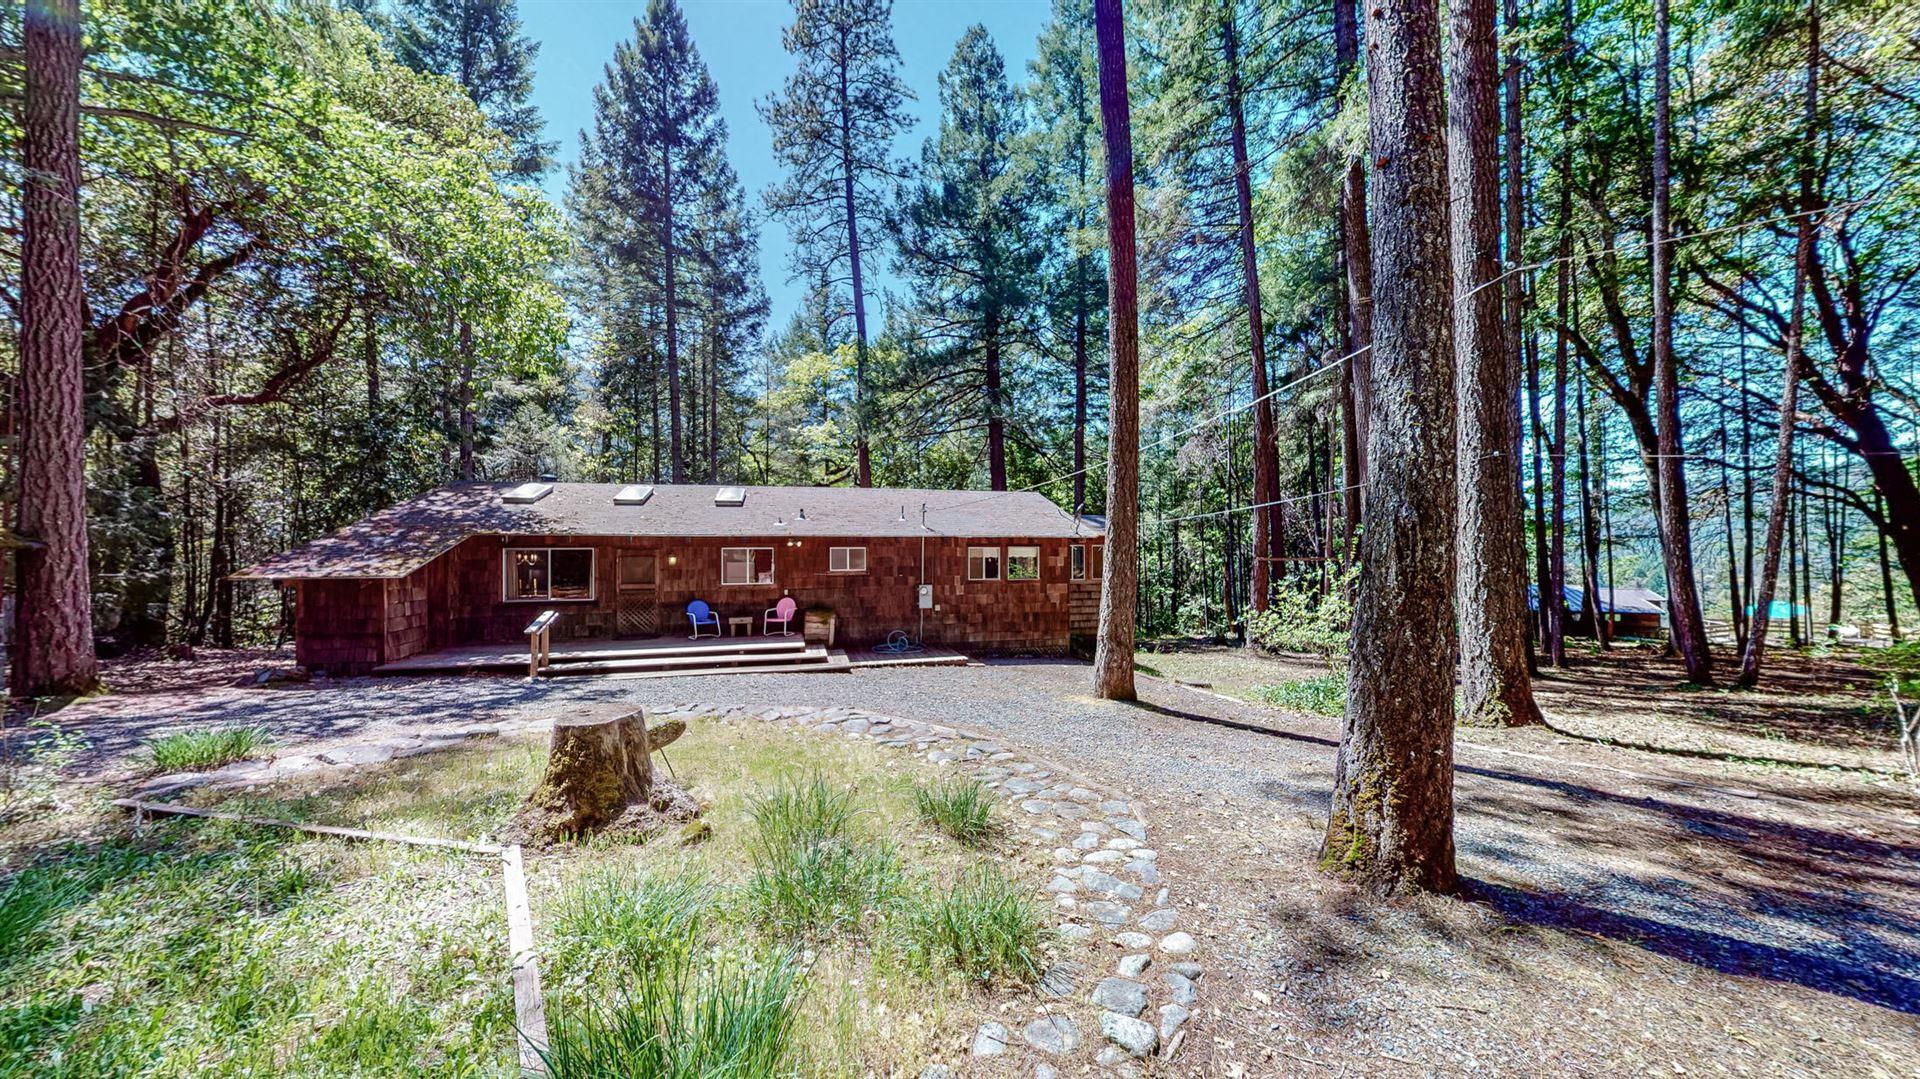 193 & 201 Coon Creek Road, Salyer, CA 95563 - MLS#: 258942